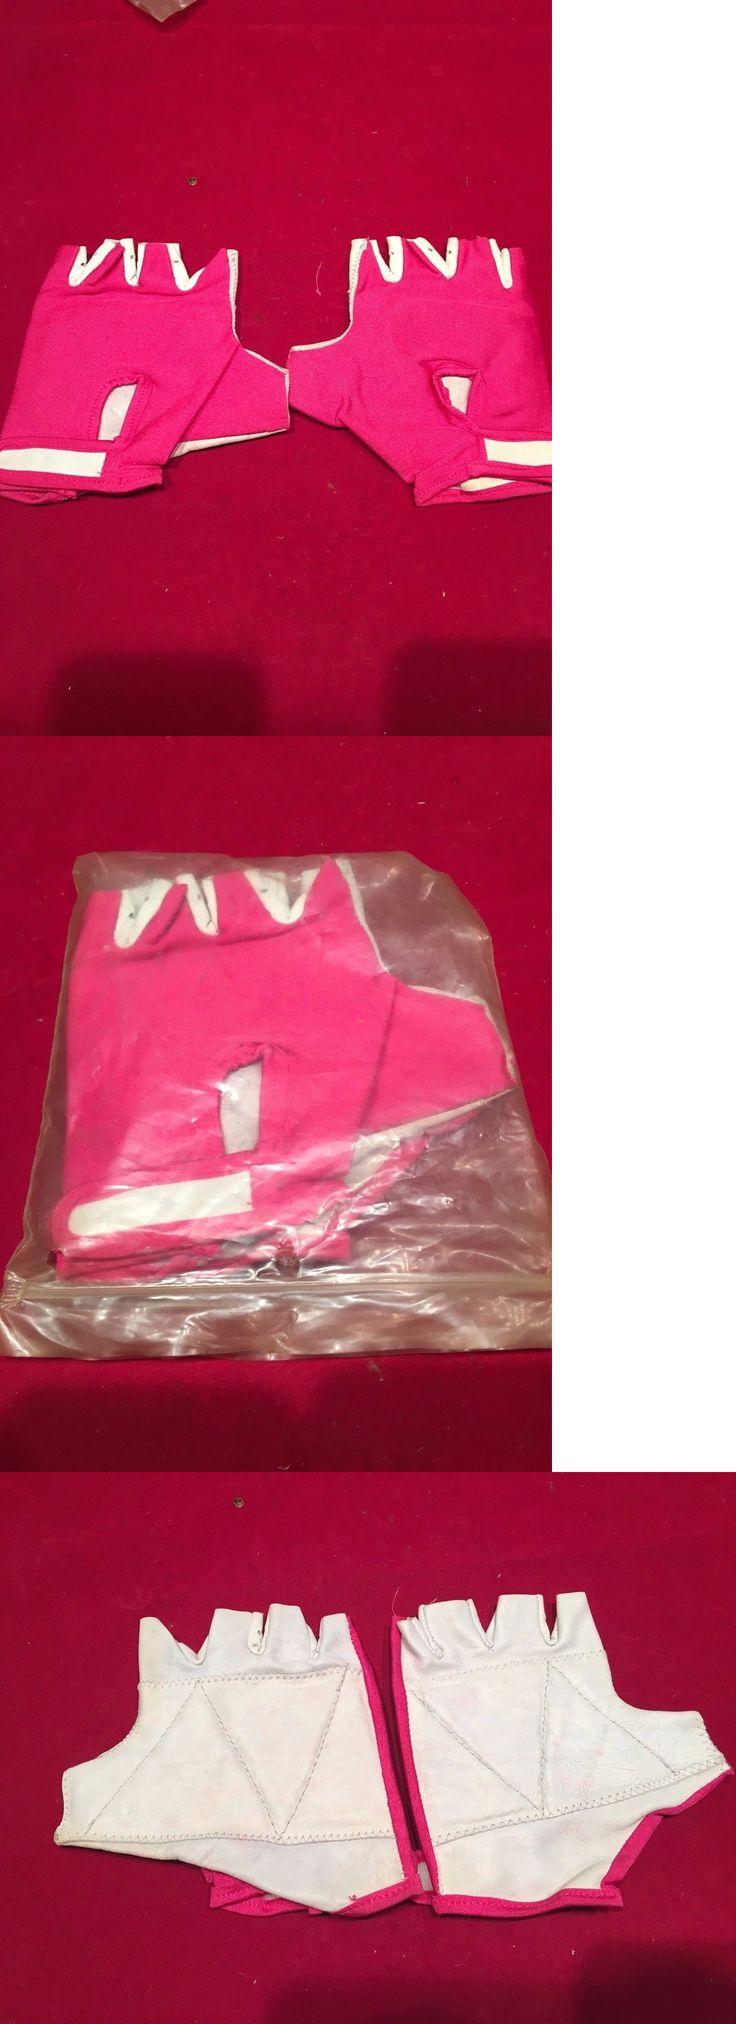 Gloves 22683: Nos Vintage Vela Half Finger Pink And Leather Large Bmx Gloves Bmx Freestyle -> BUY IT NOW ONLY: $49.99 on eBay!